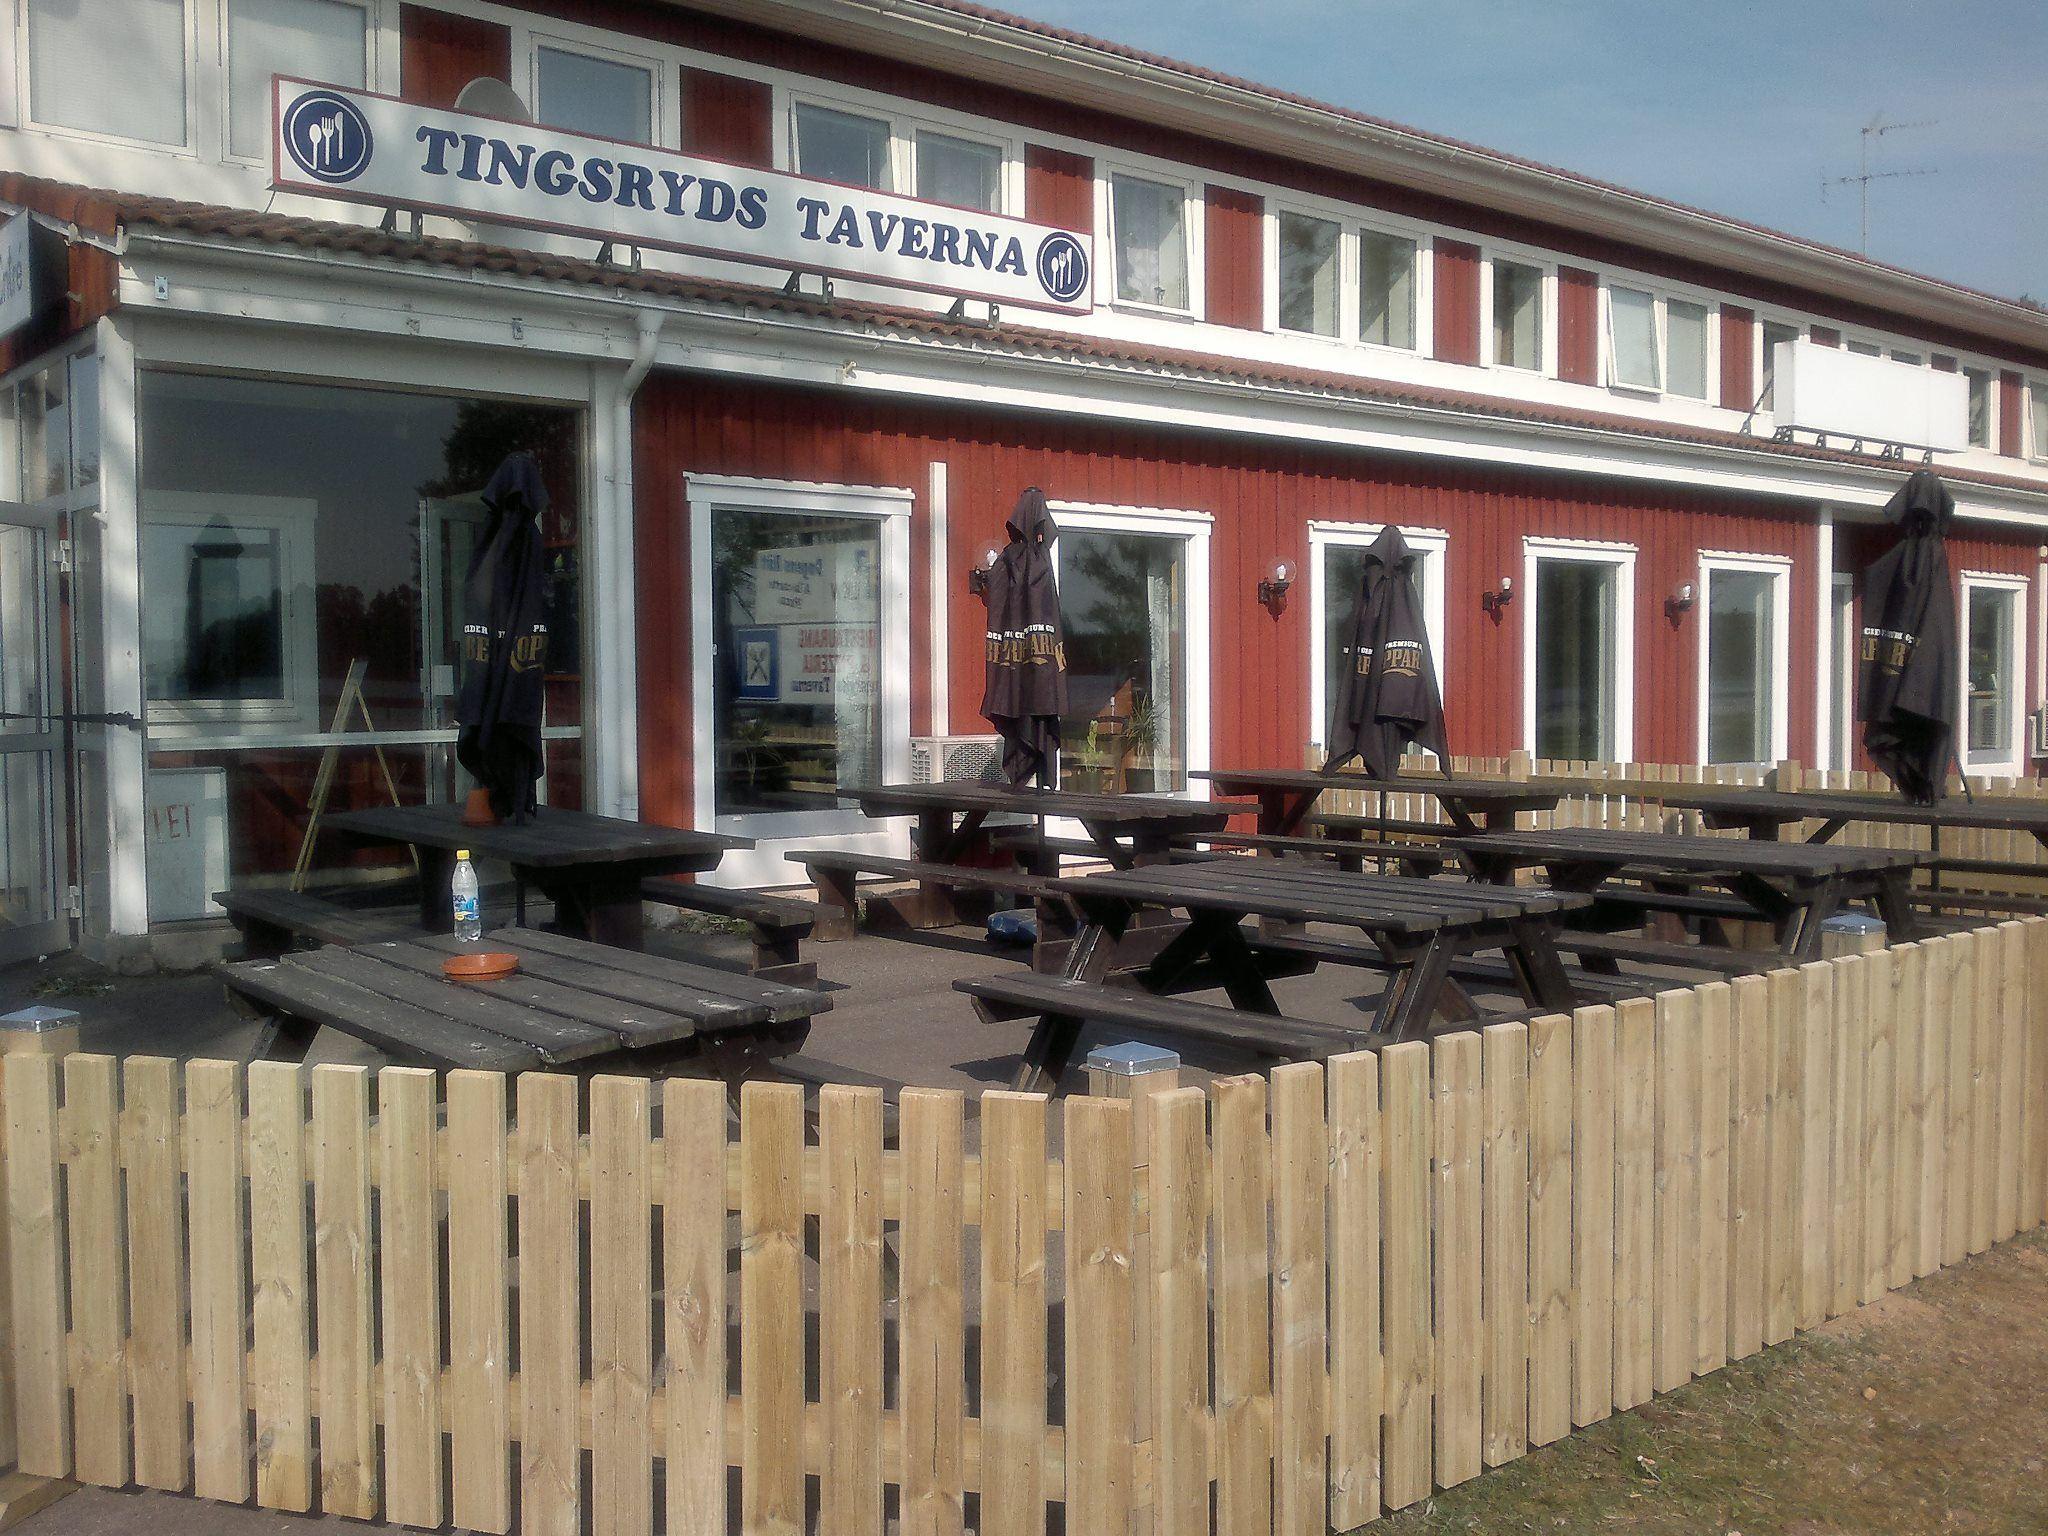 Tingsryds Taverne Stop Inn